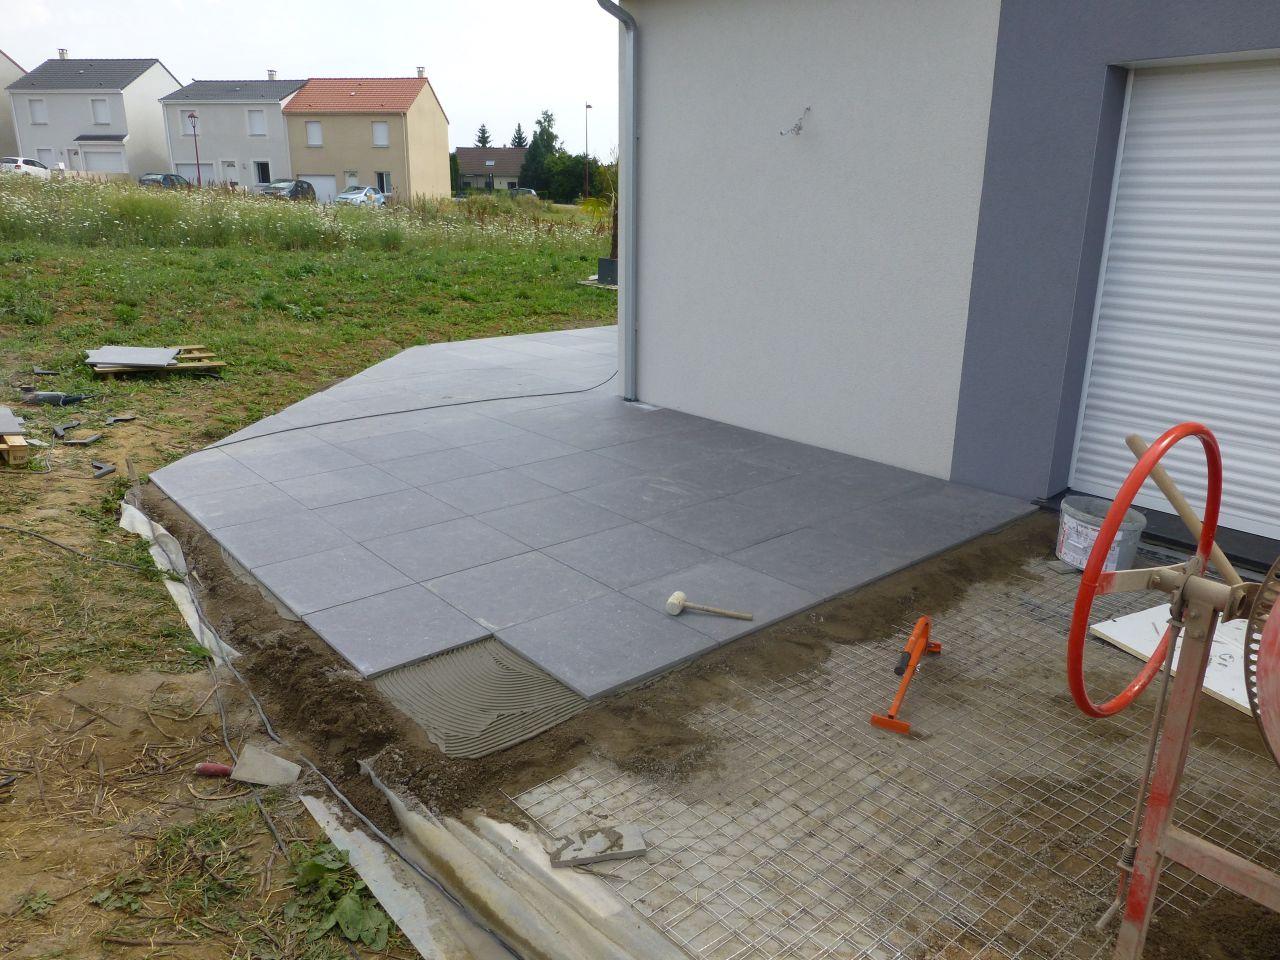 Carrelage ep 2 cm pour terrasse solution id al 64 for Carrelage terrasse 60x60